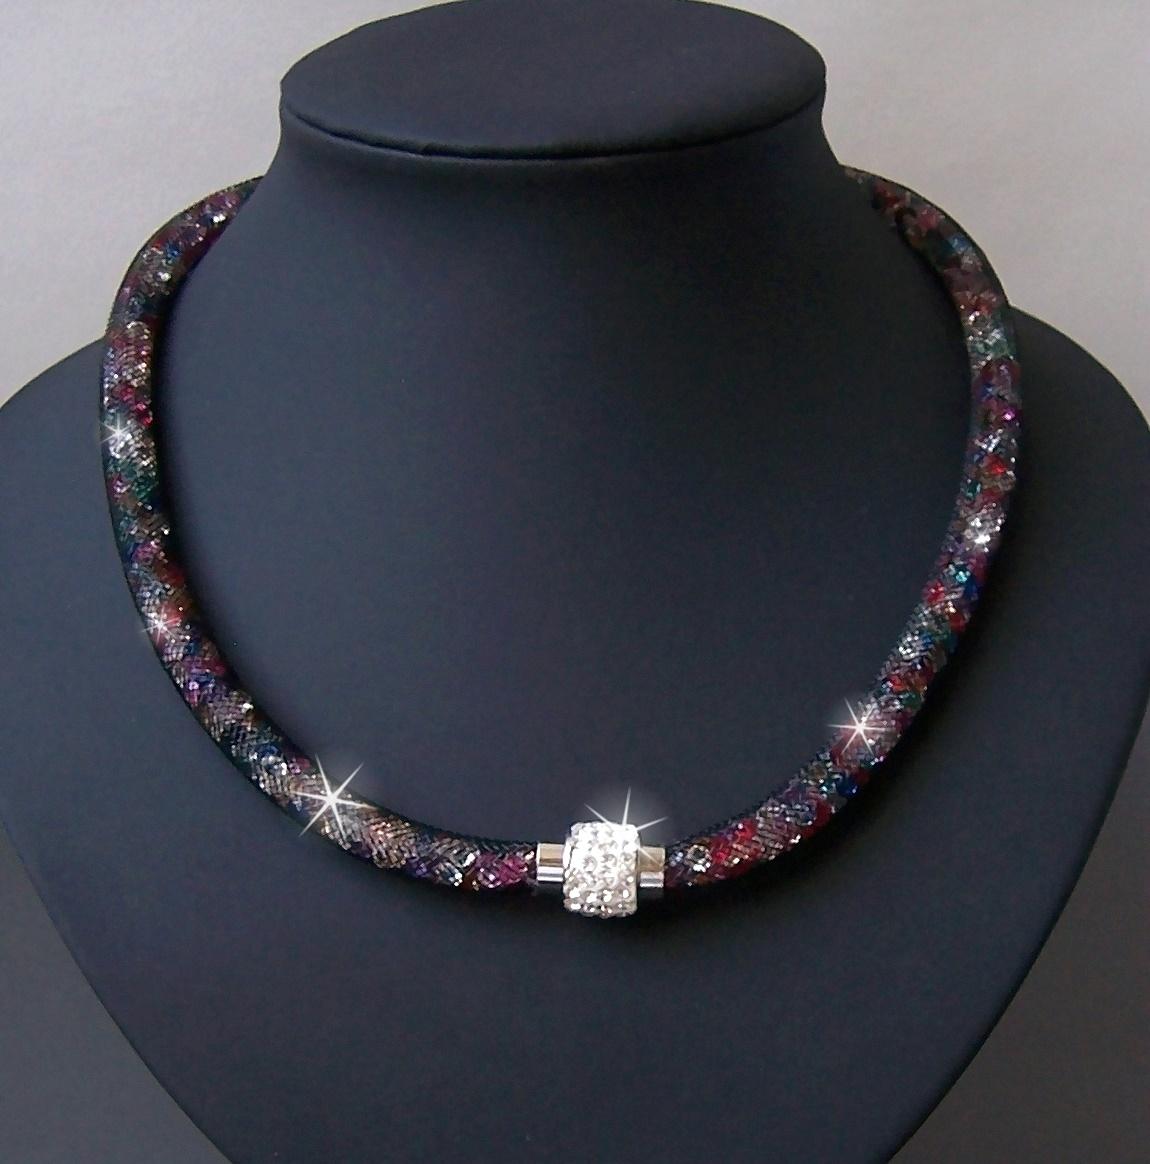 K2335# Collier Kristalle in Nylonnetzschlauch Shamballa Star bunt